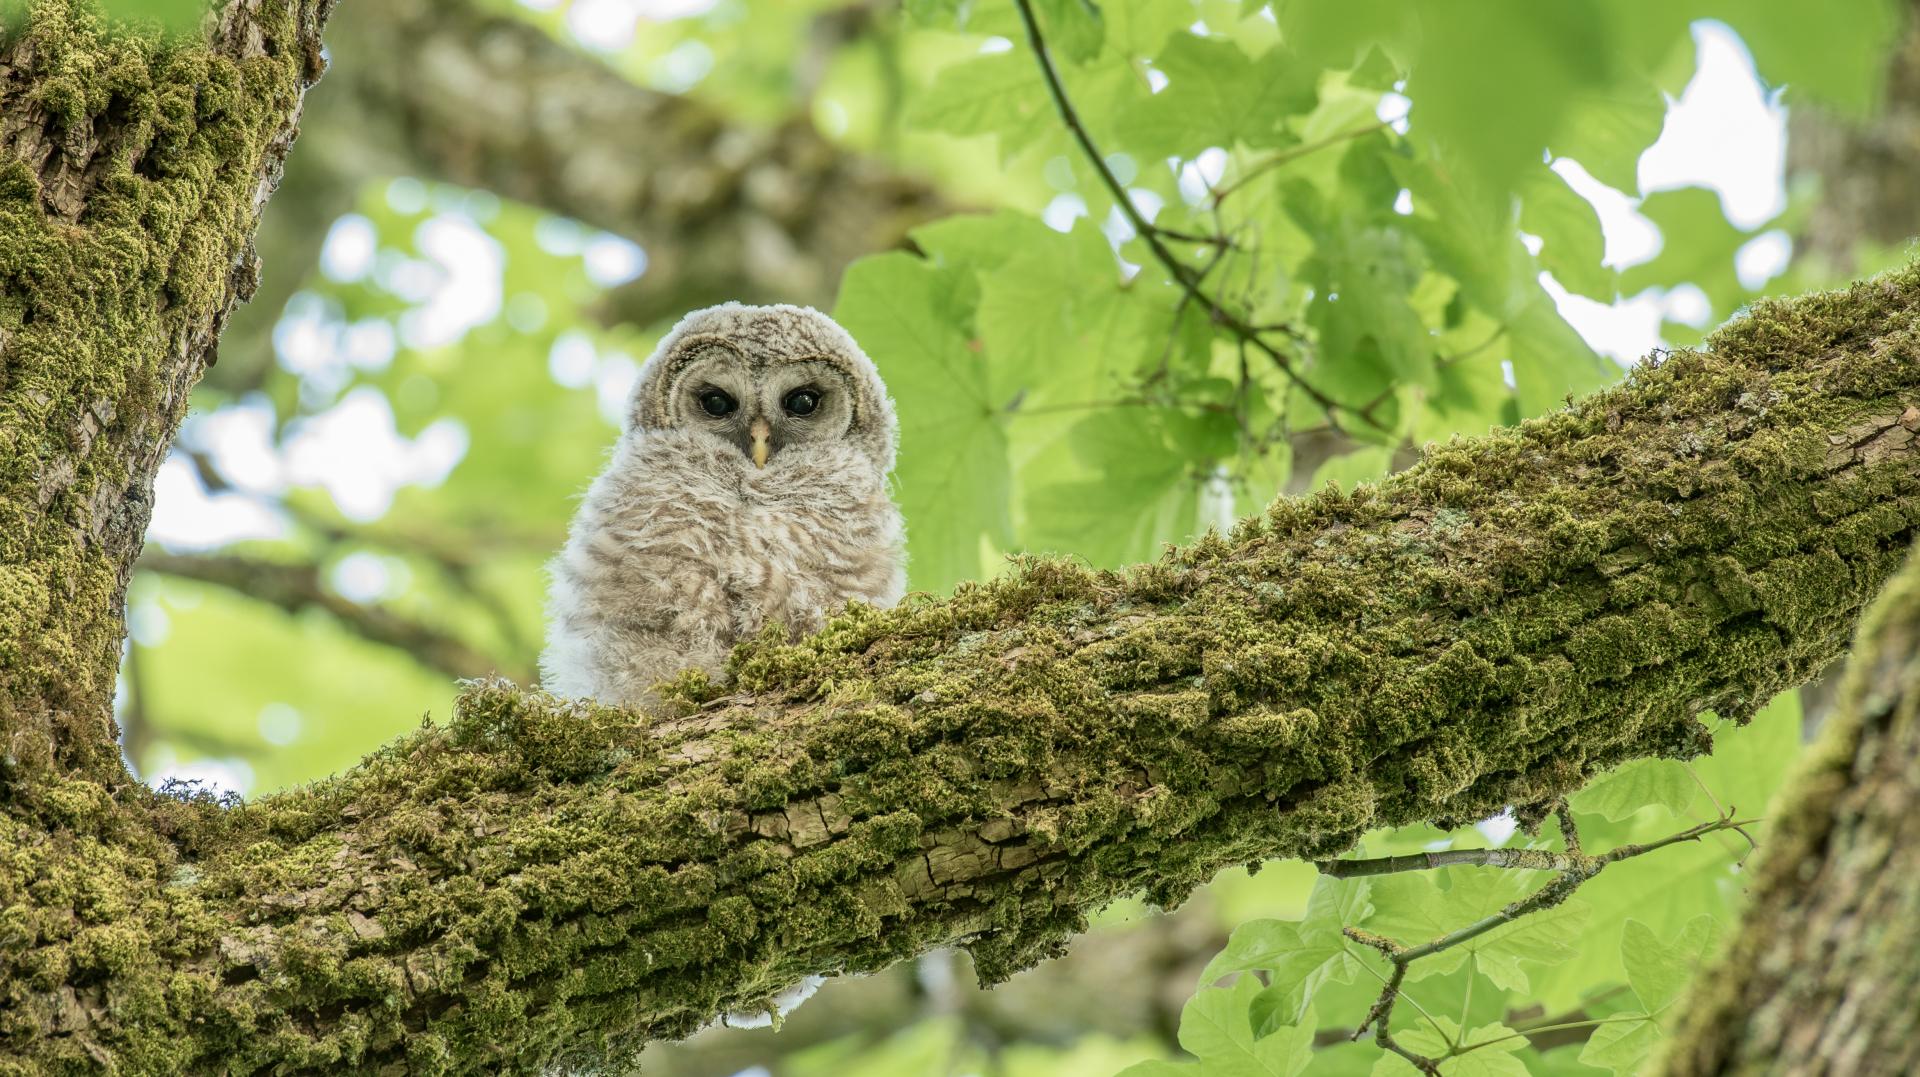 Owls and Sapsuckers Photo walk May 20 2017